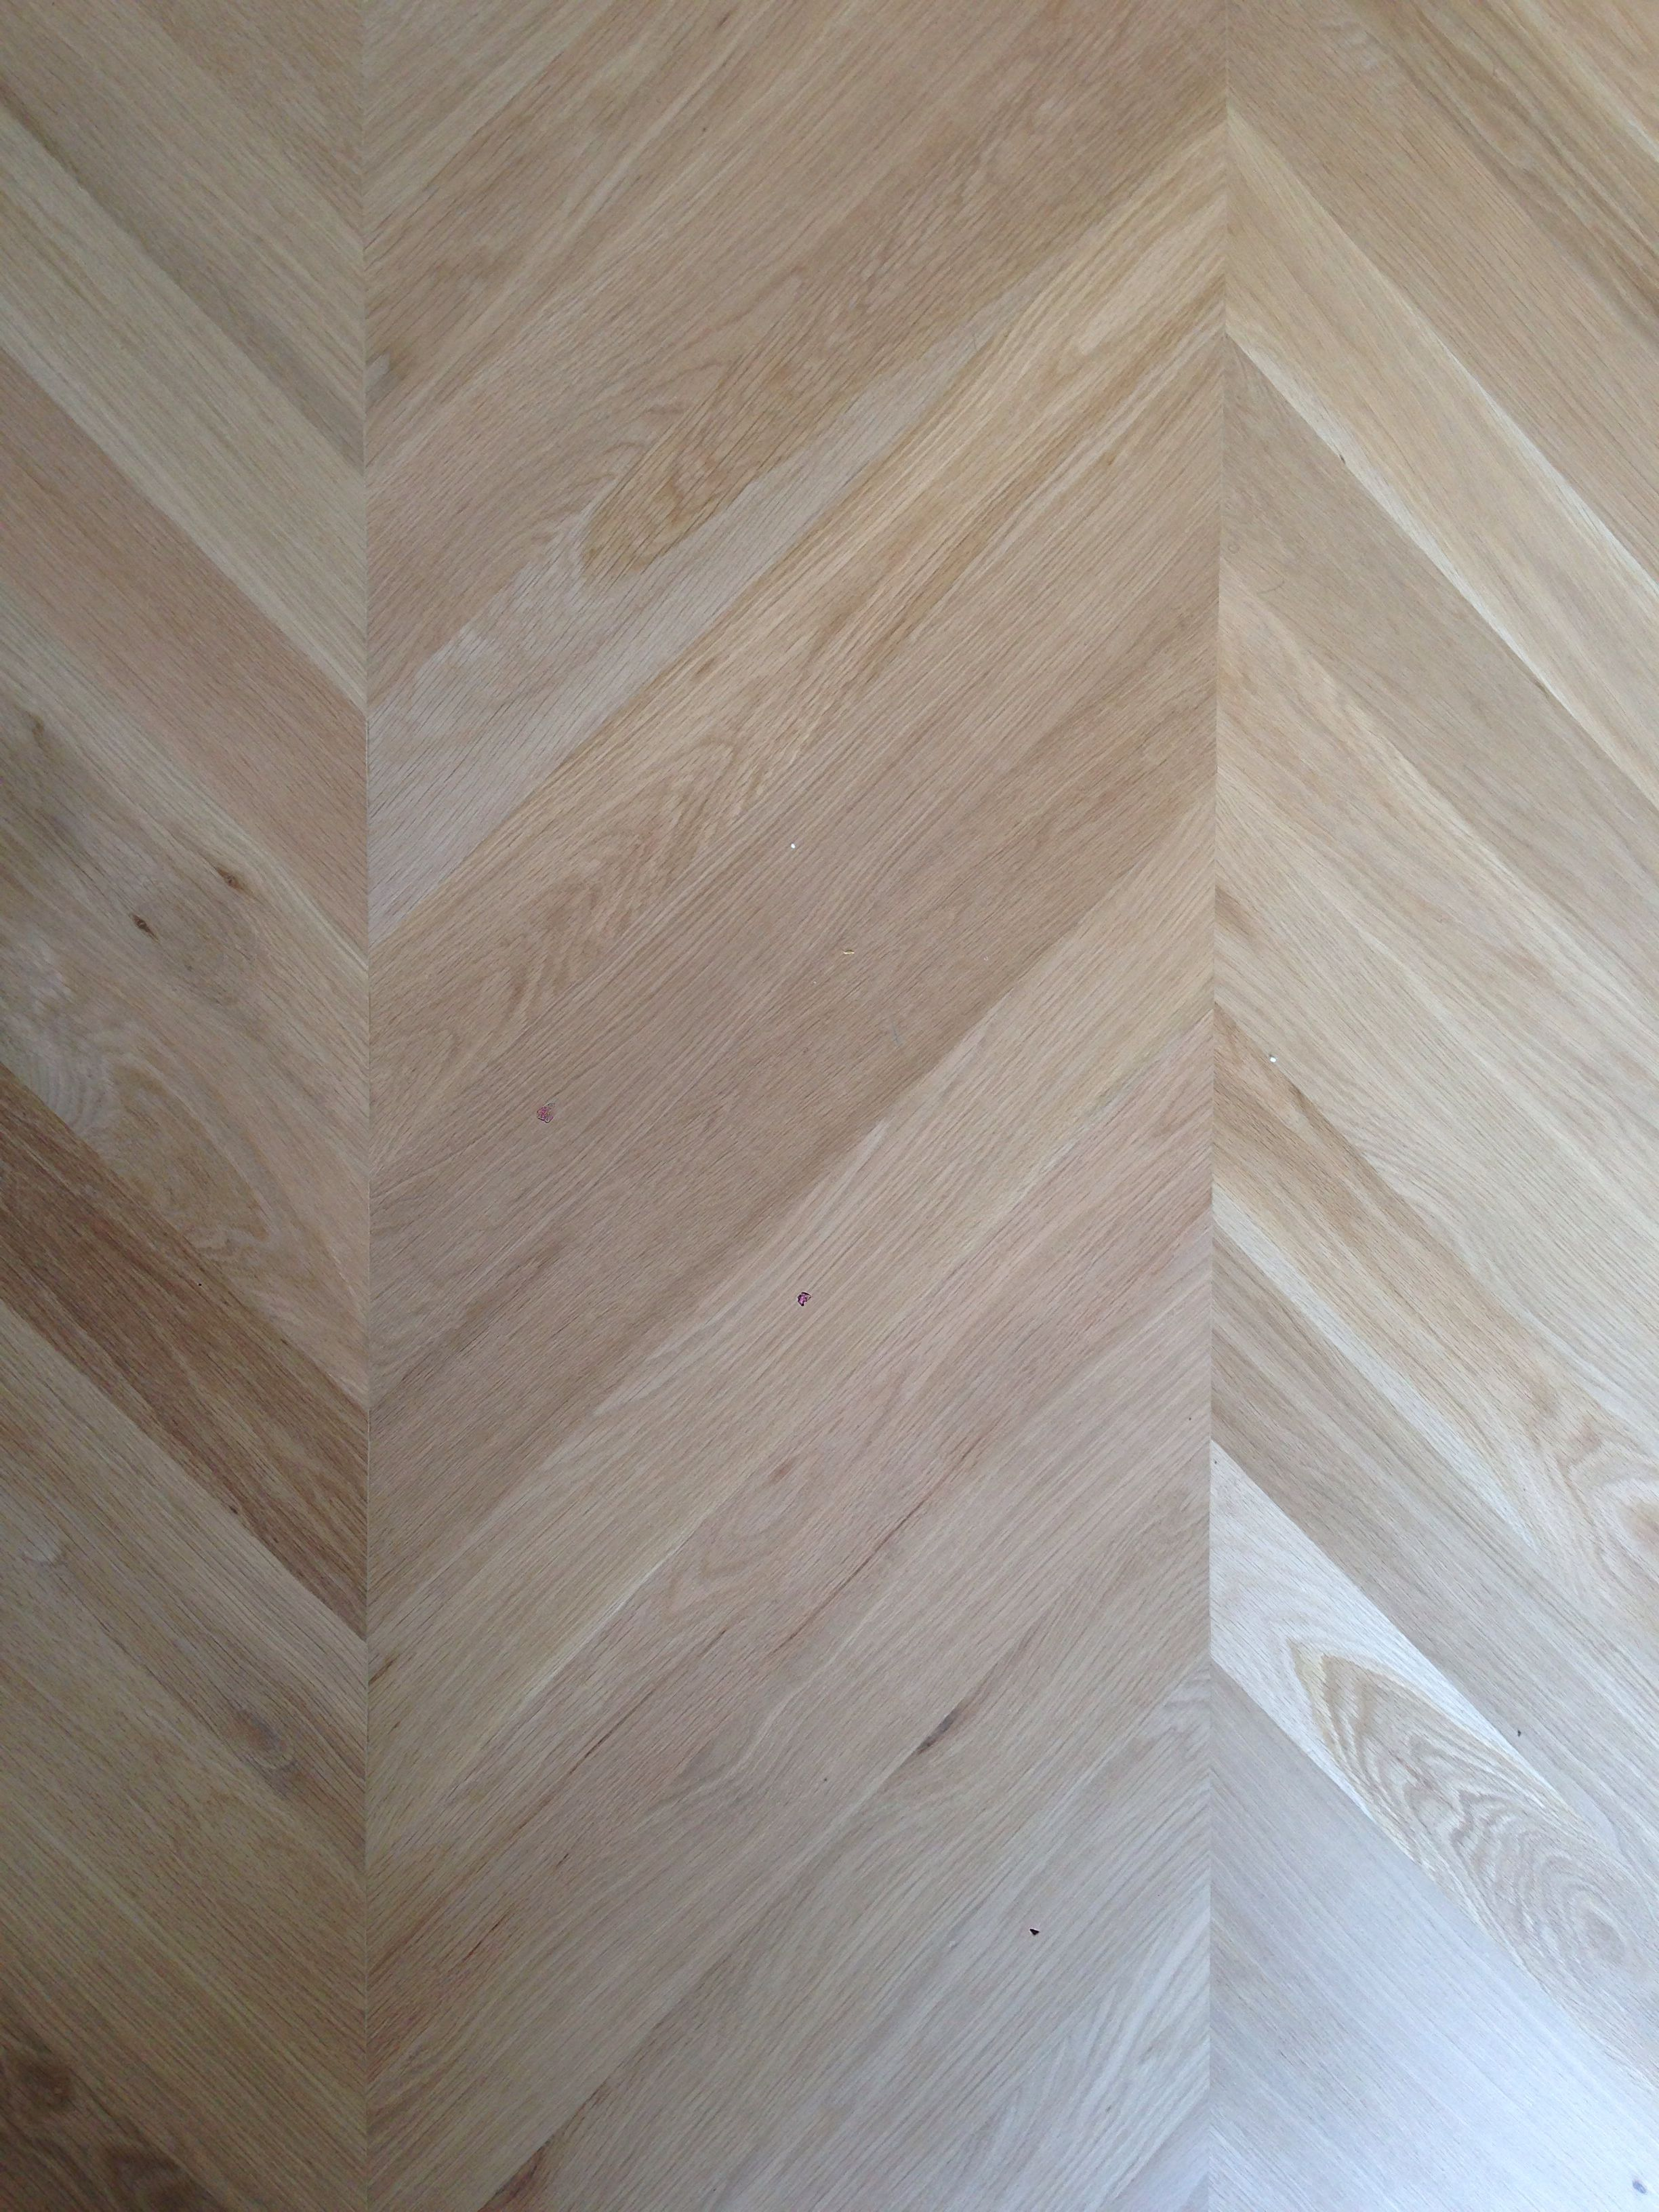 Chevron Ash Wood Floor Paint Materials Pinterest: ash wood flooring